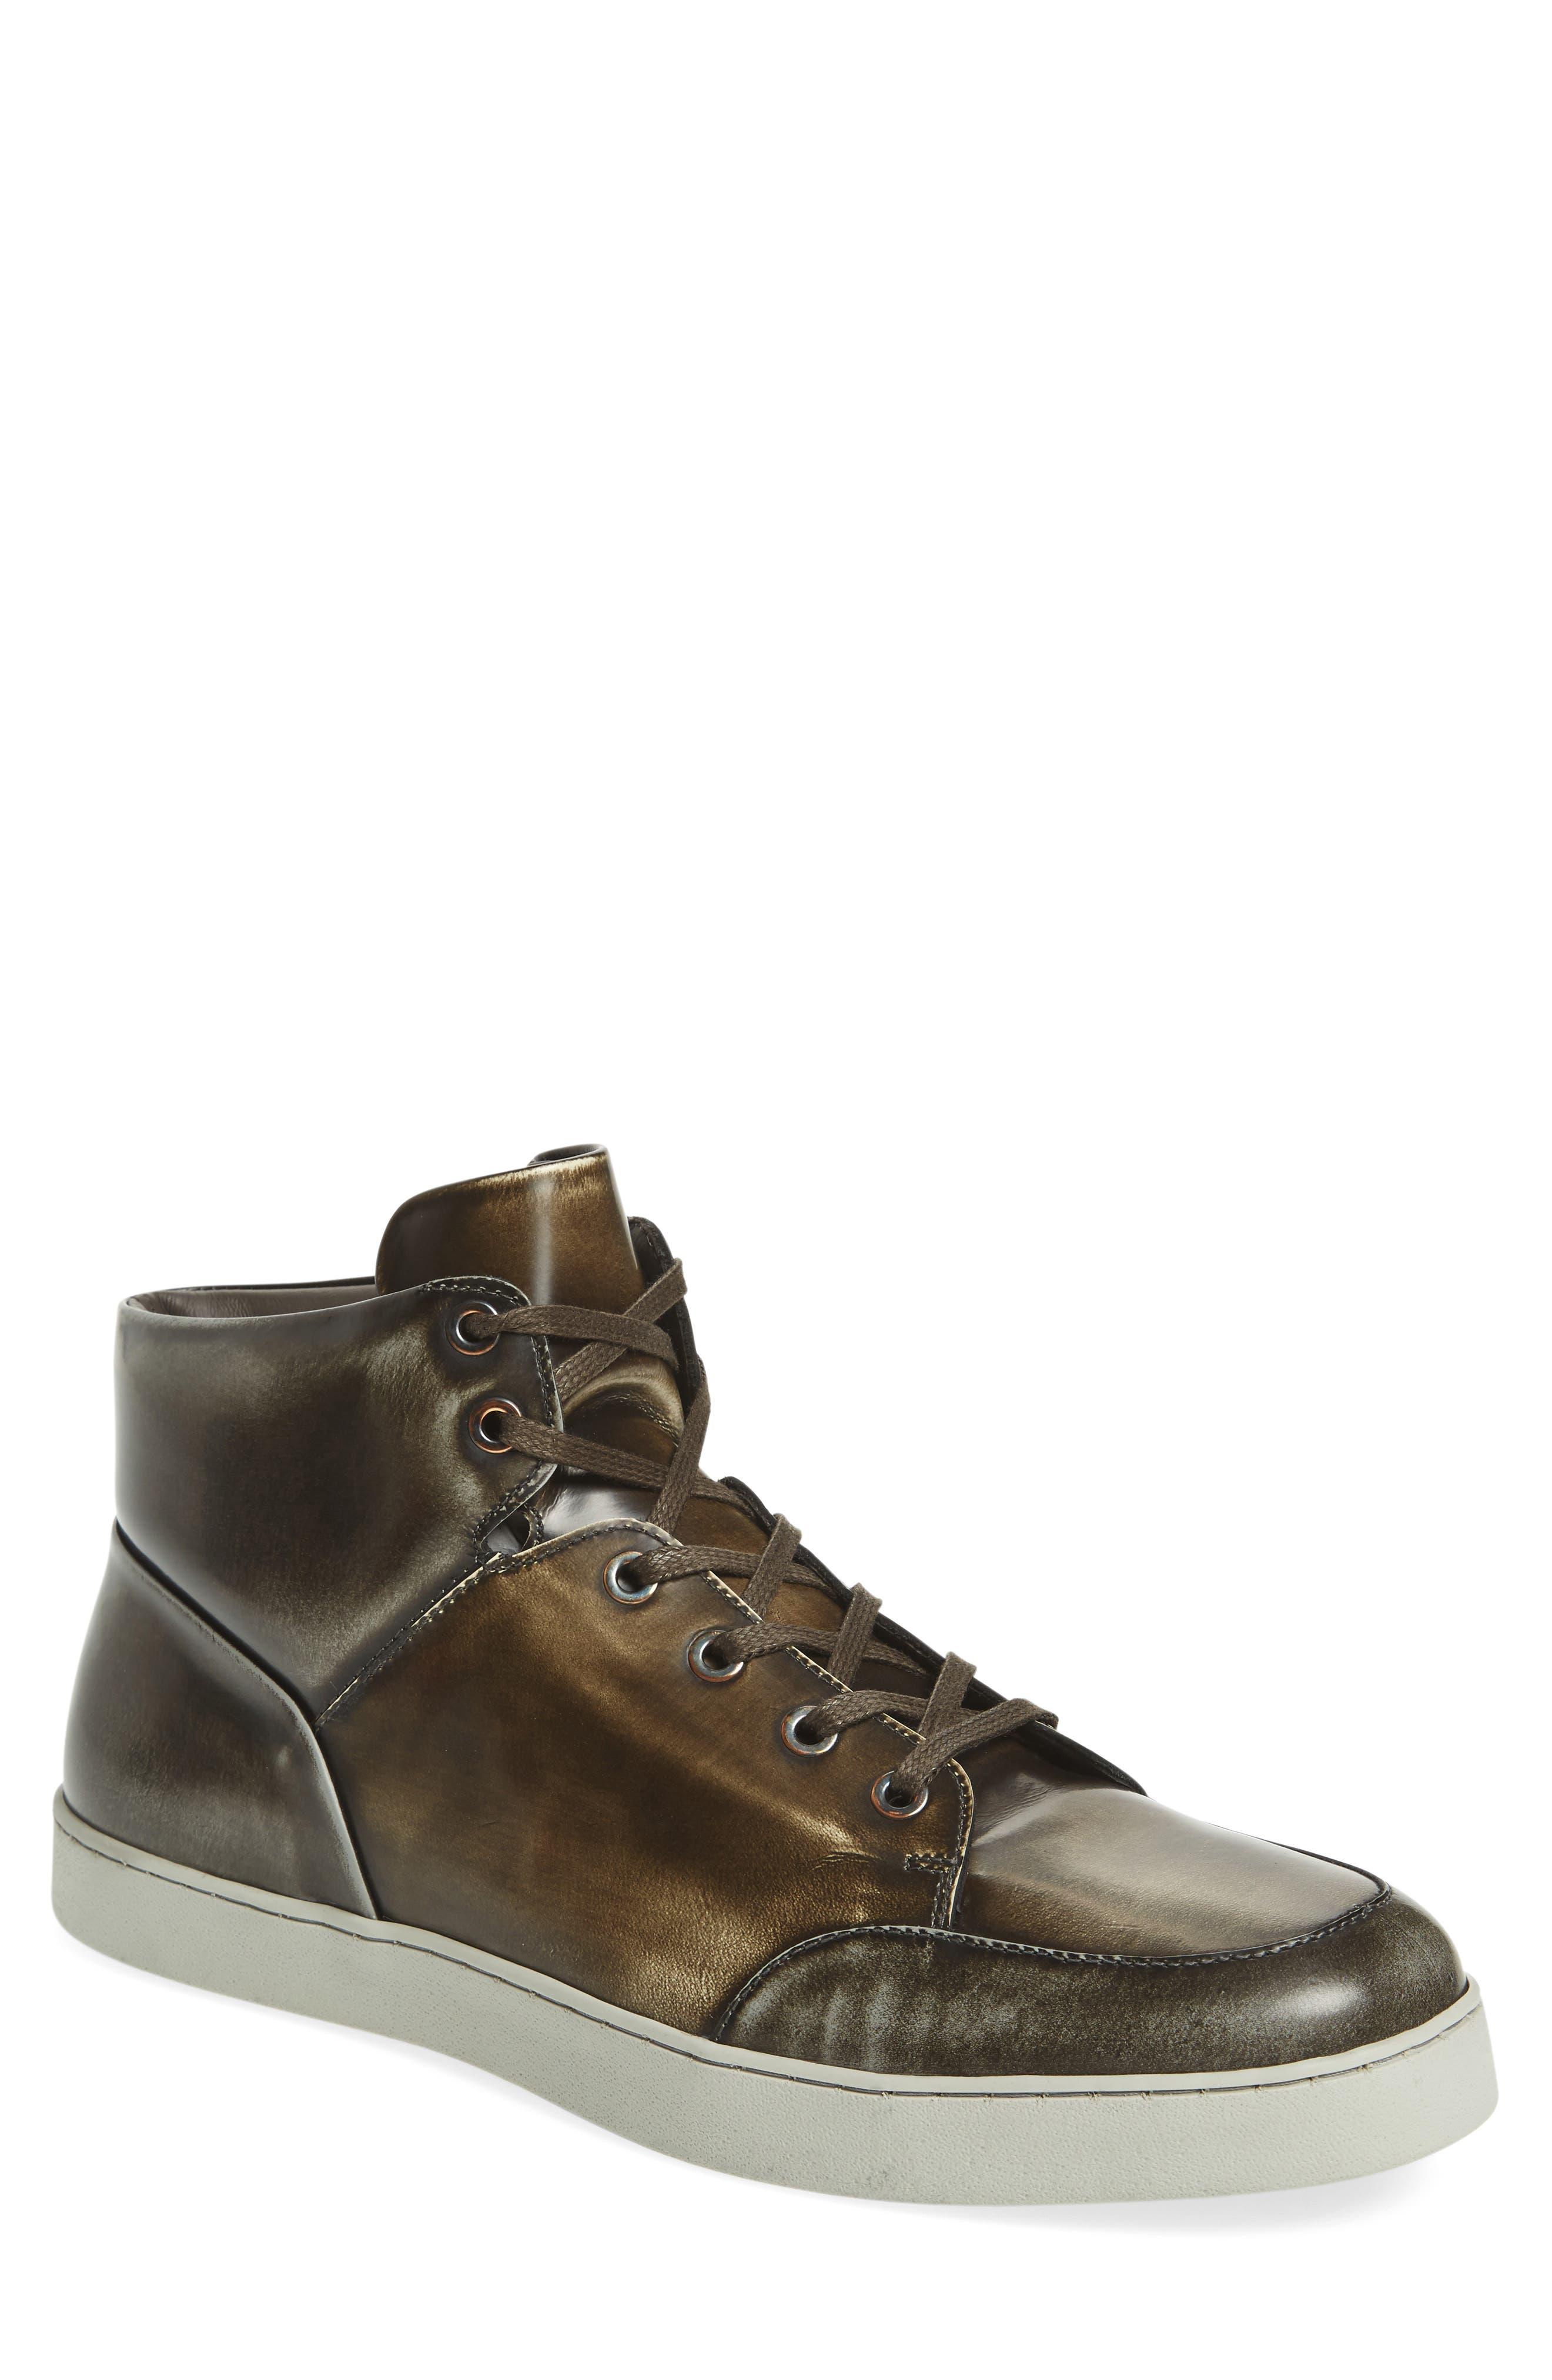 Gidean High Top Sneaker,                         Main,                         color, 006